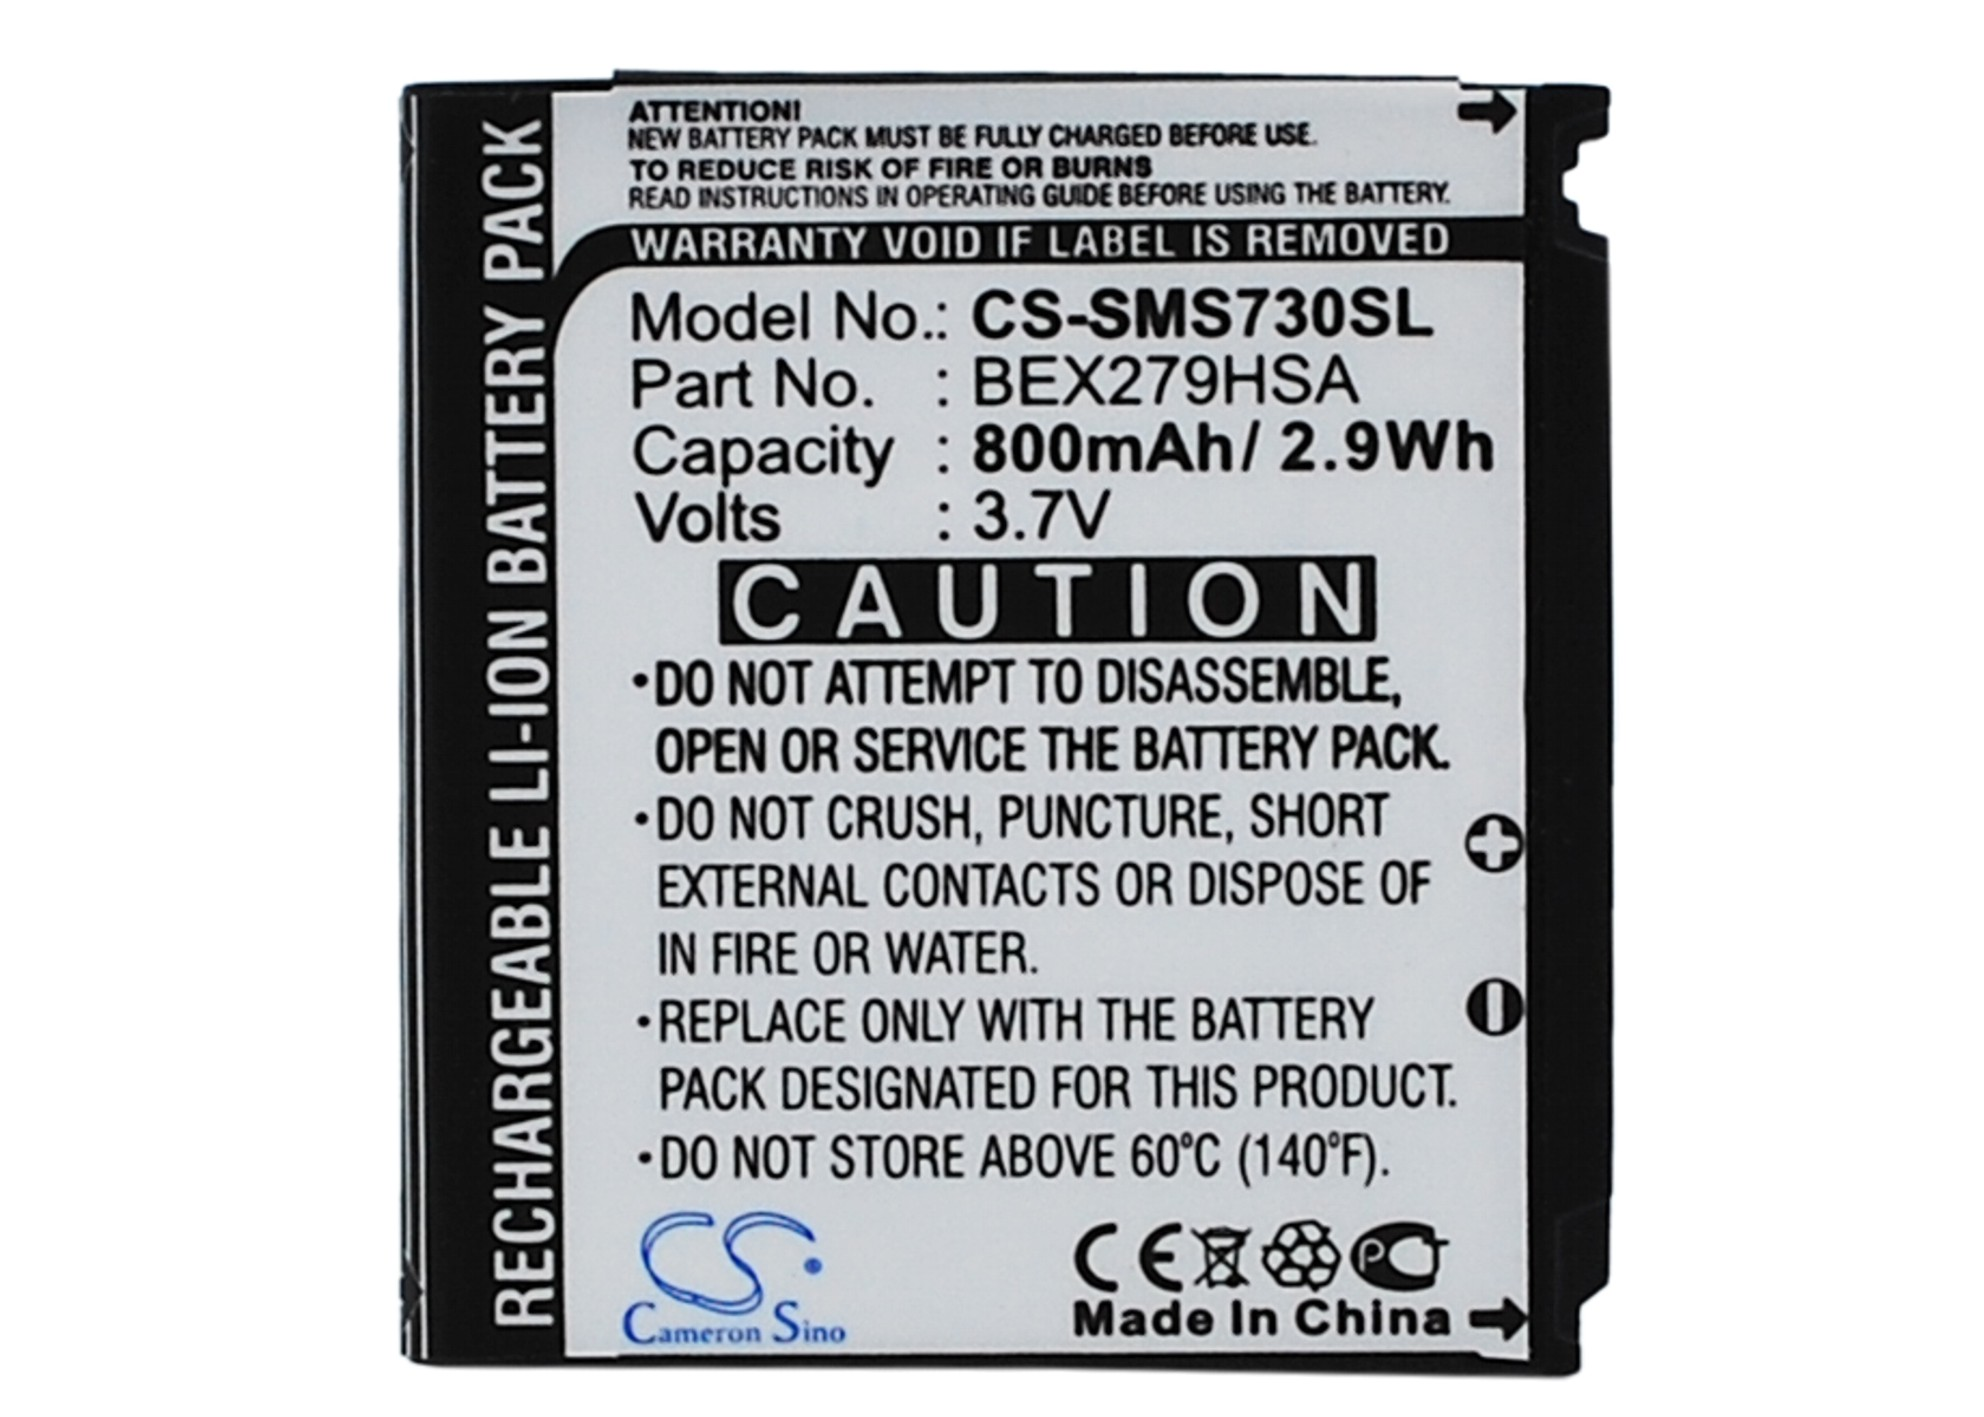 Cameron Sino baterie do mobilů pro SAMSUNG SGH-S730i 3.7V Li-ion 800mAh černá - neoriginální